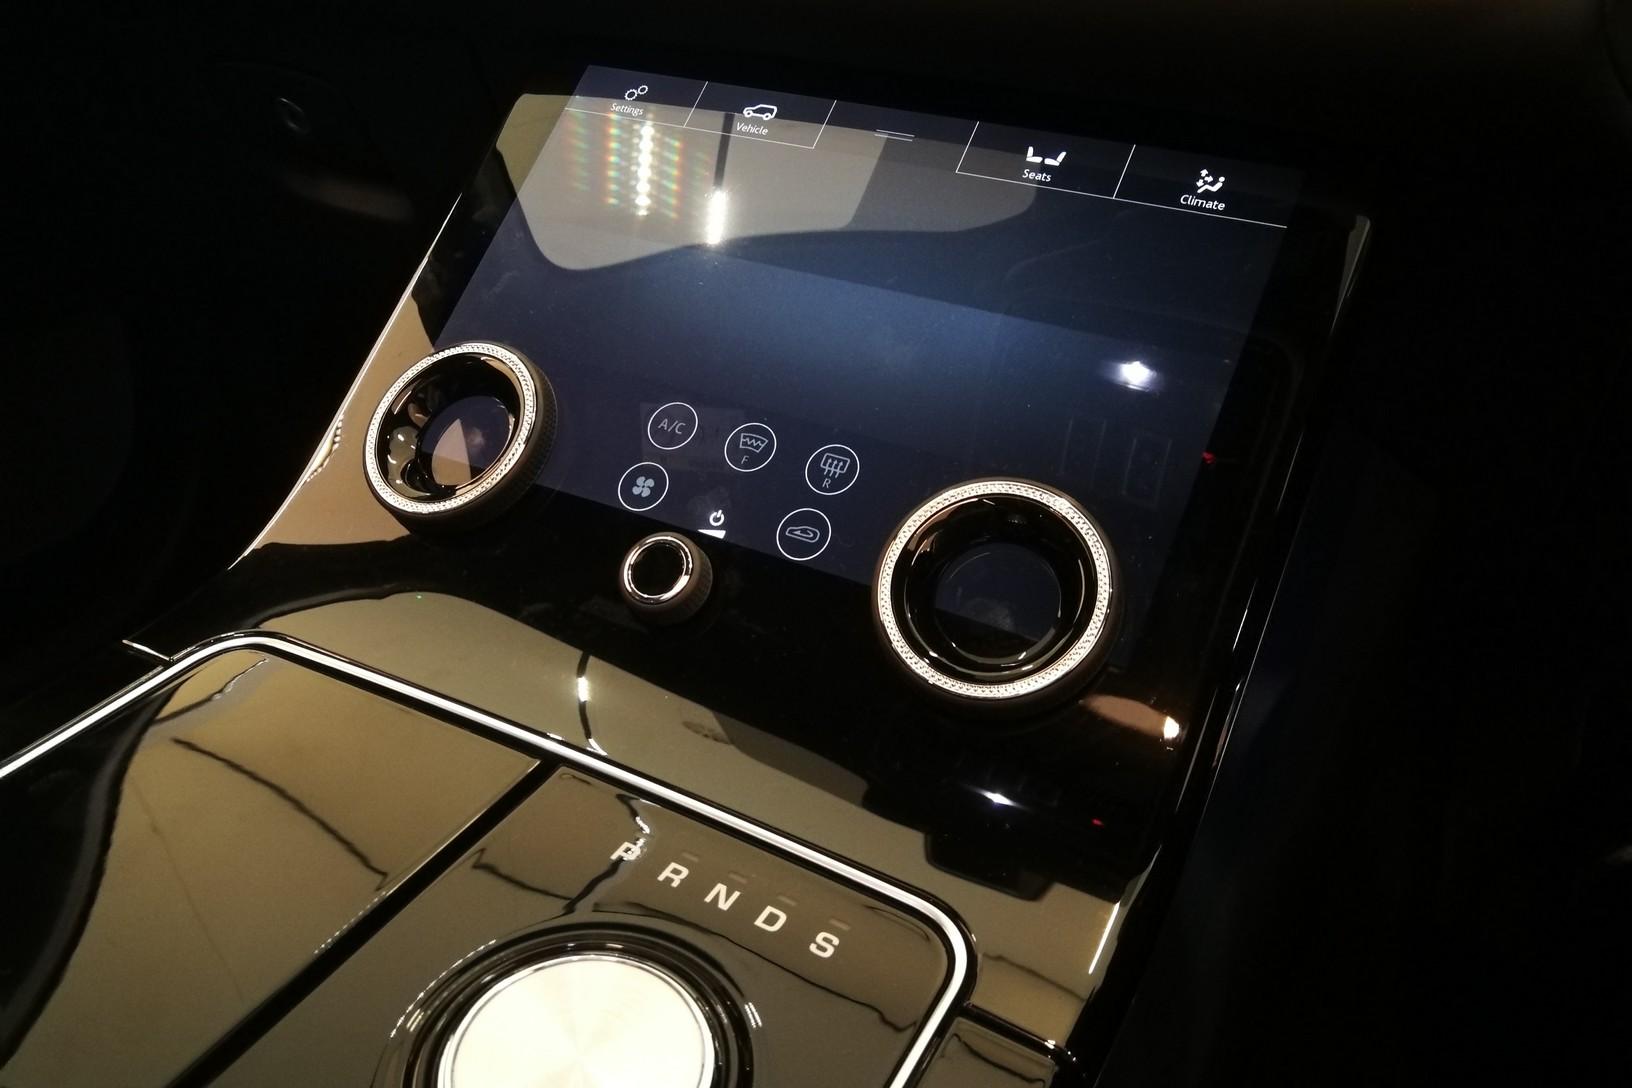 Land Rover Range Rover Velar 5.0 P550 SVAutobiography Dynamic Edition 5dr Auto image 9